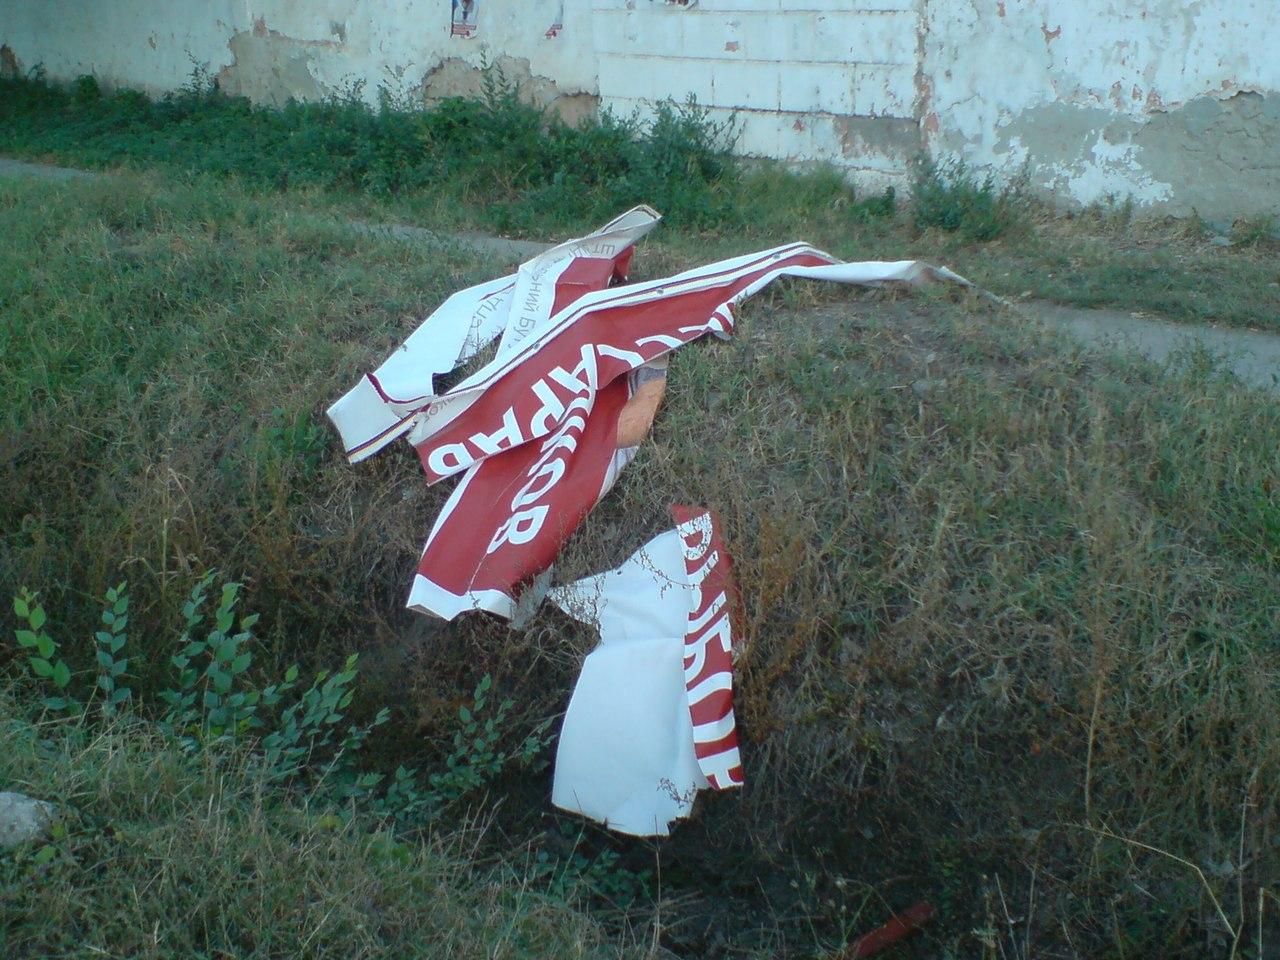 EsKrP06B4ow Болград. В очередной раз сорван баннер кандидата Александра Борнякова